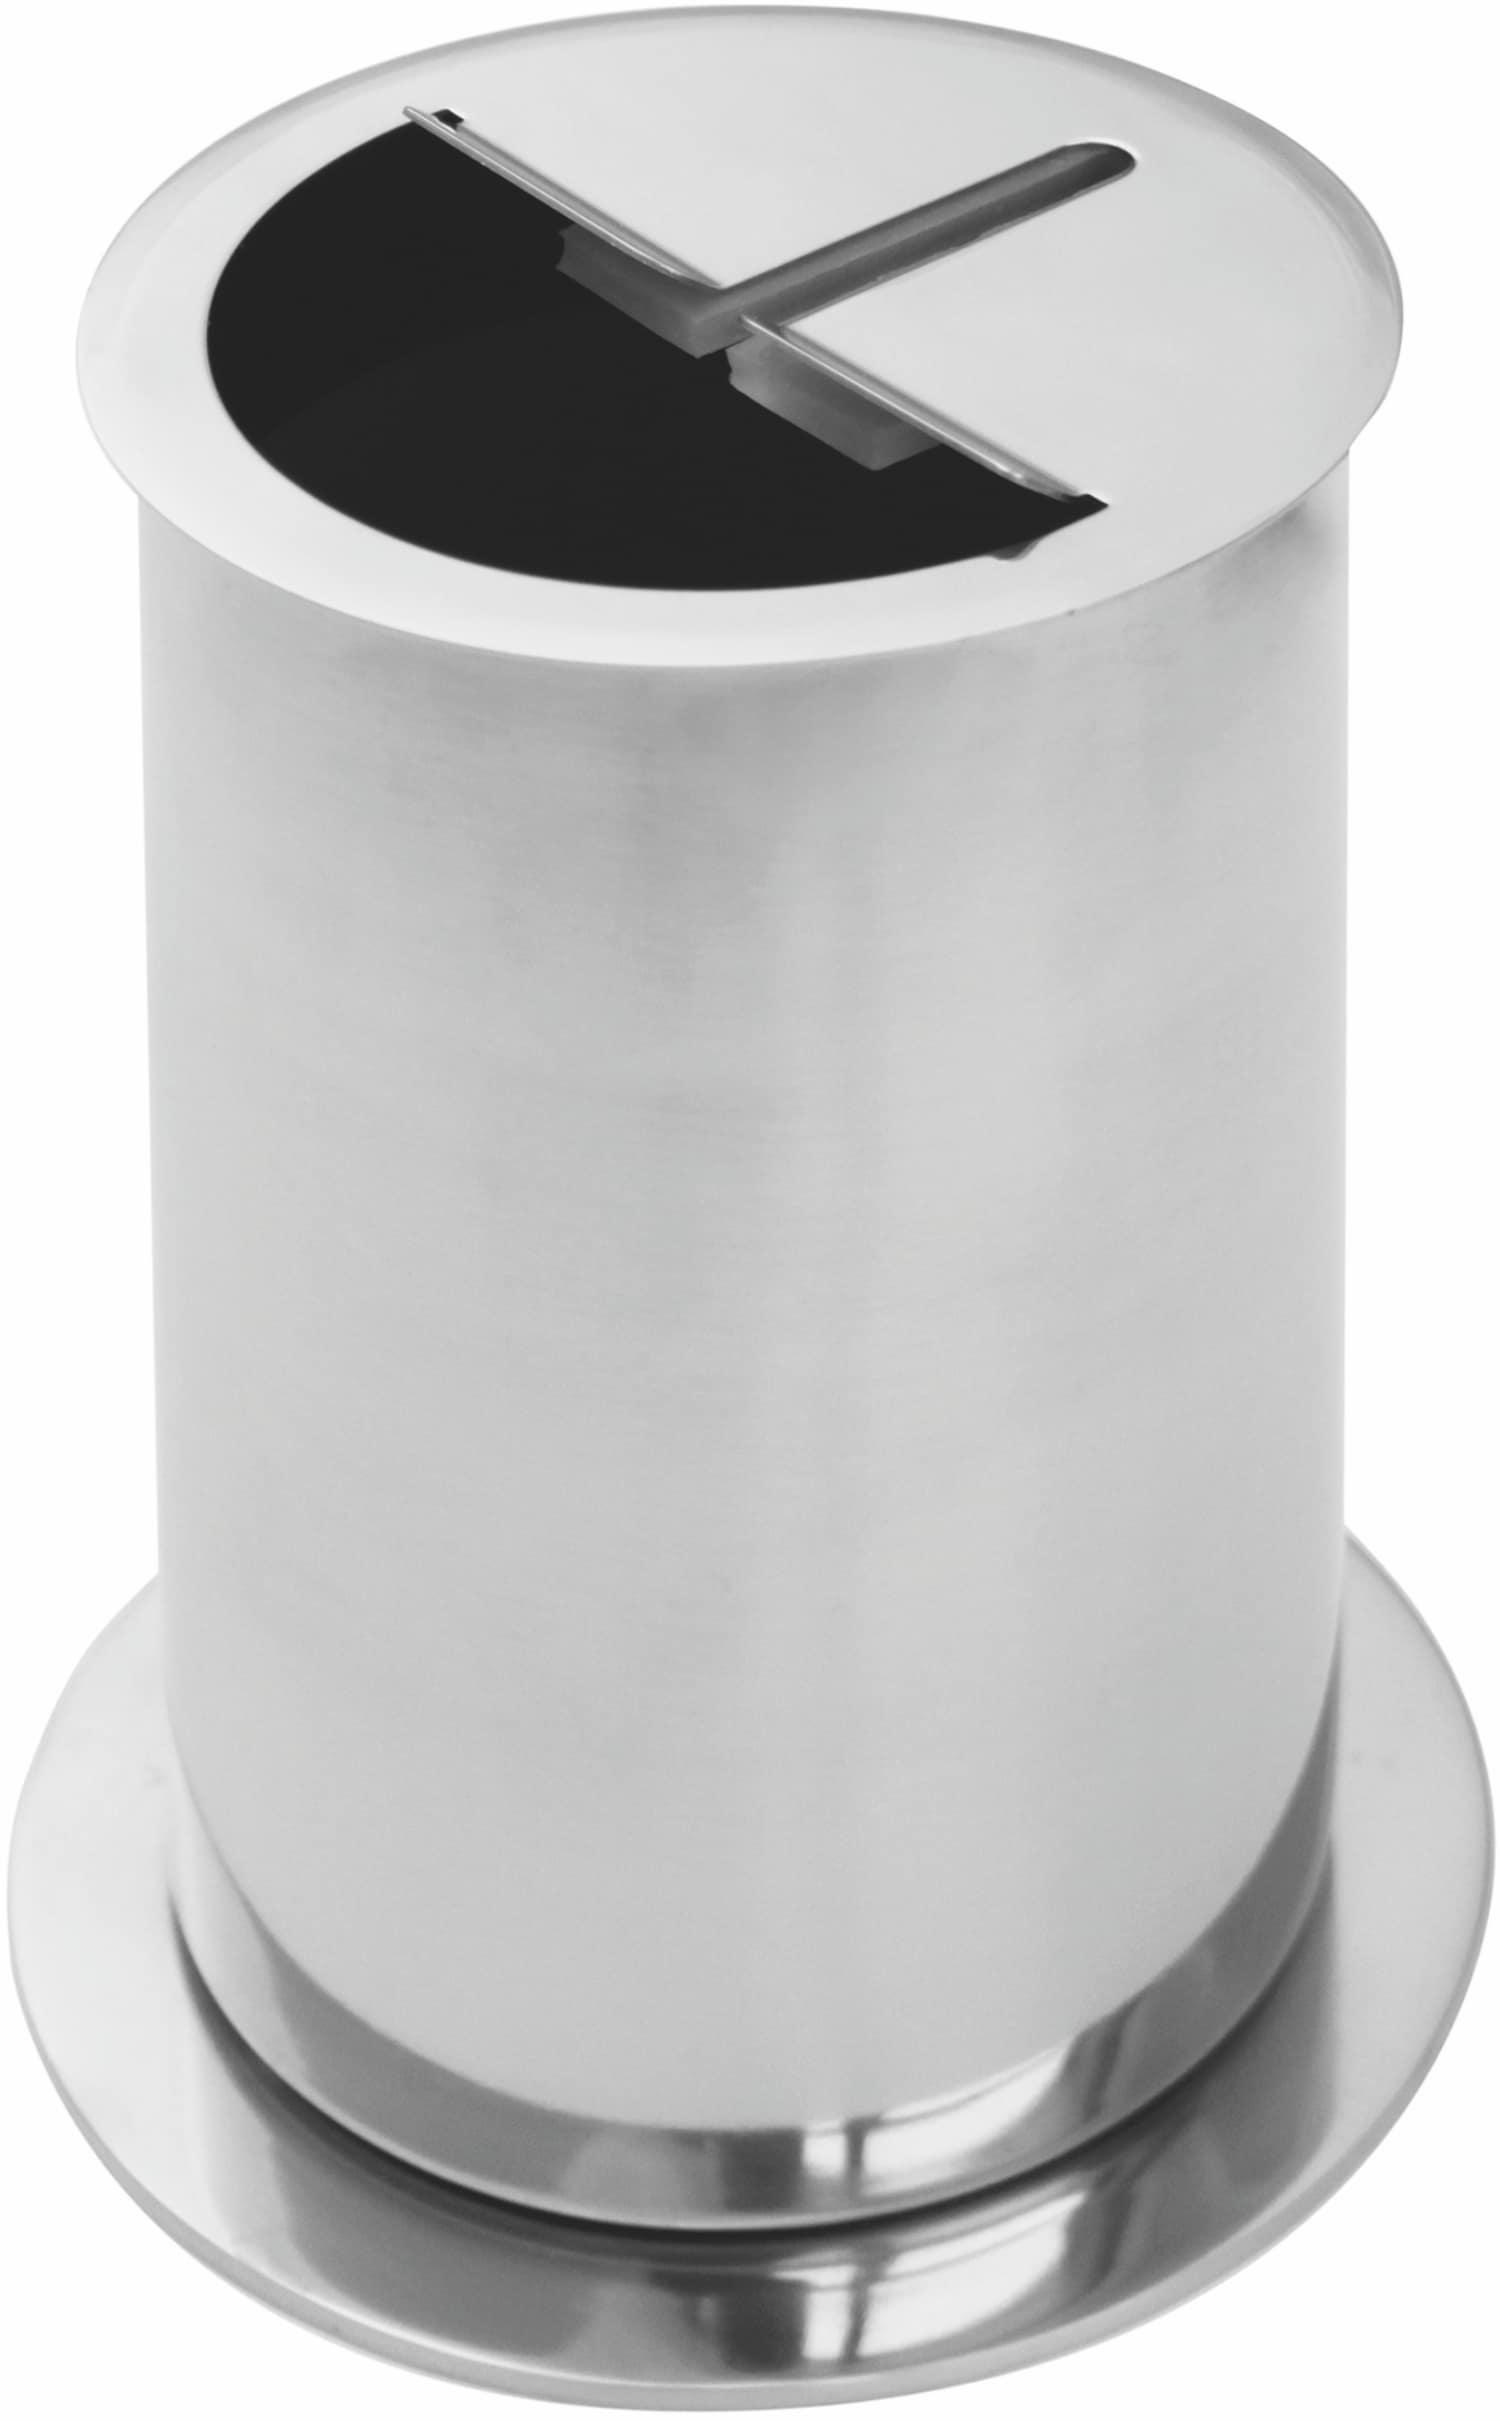 Messer-Abstreifbehälter Standgerät